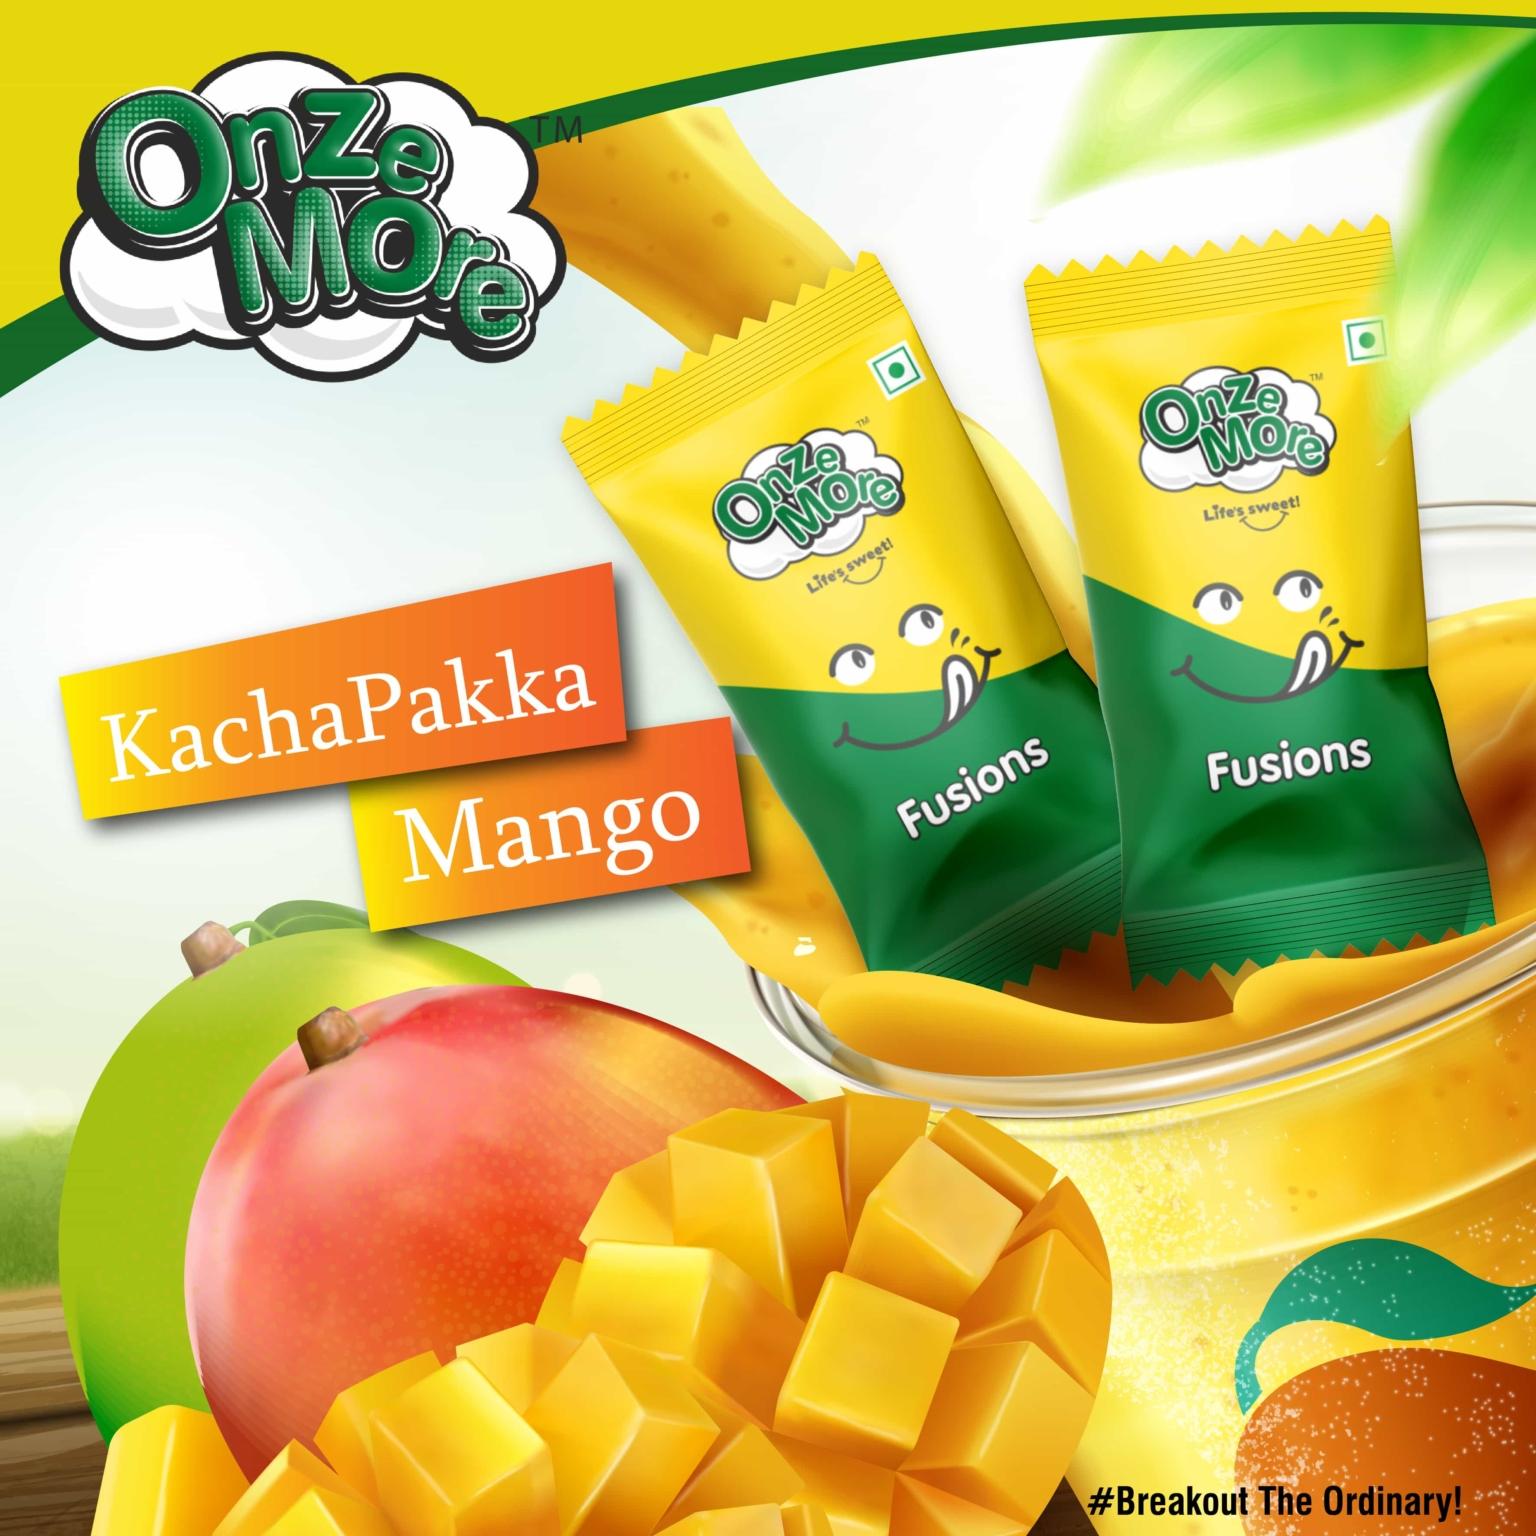 Kachhapackka Mango 01 - Season Greetings 500